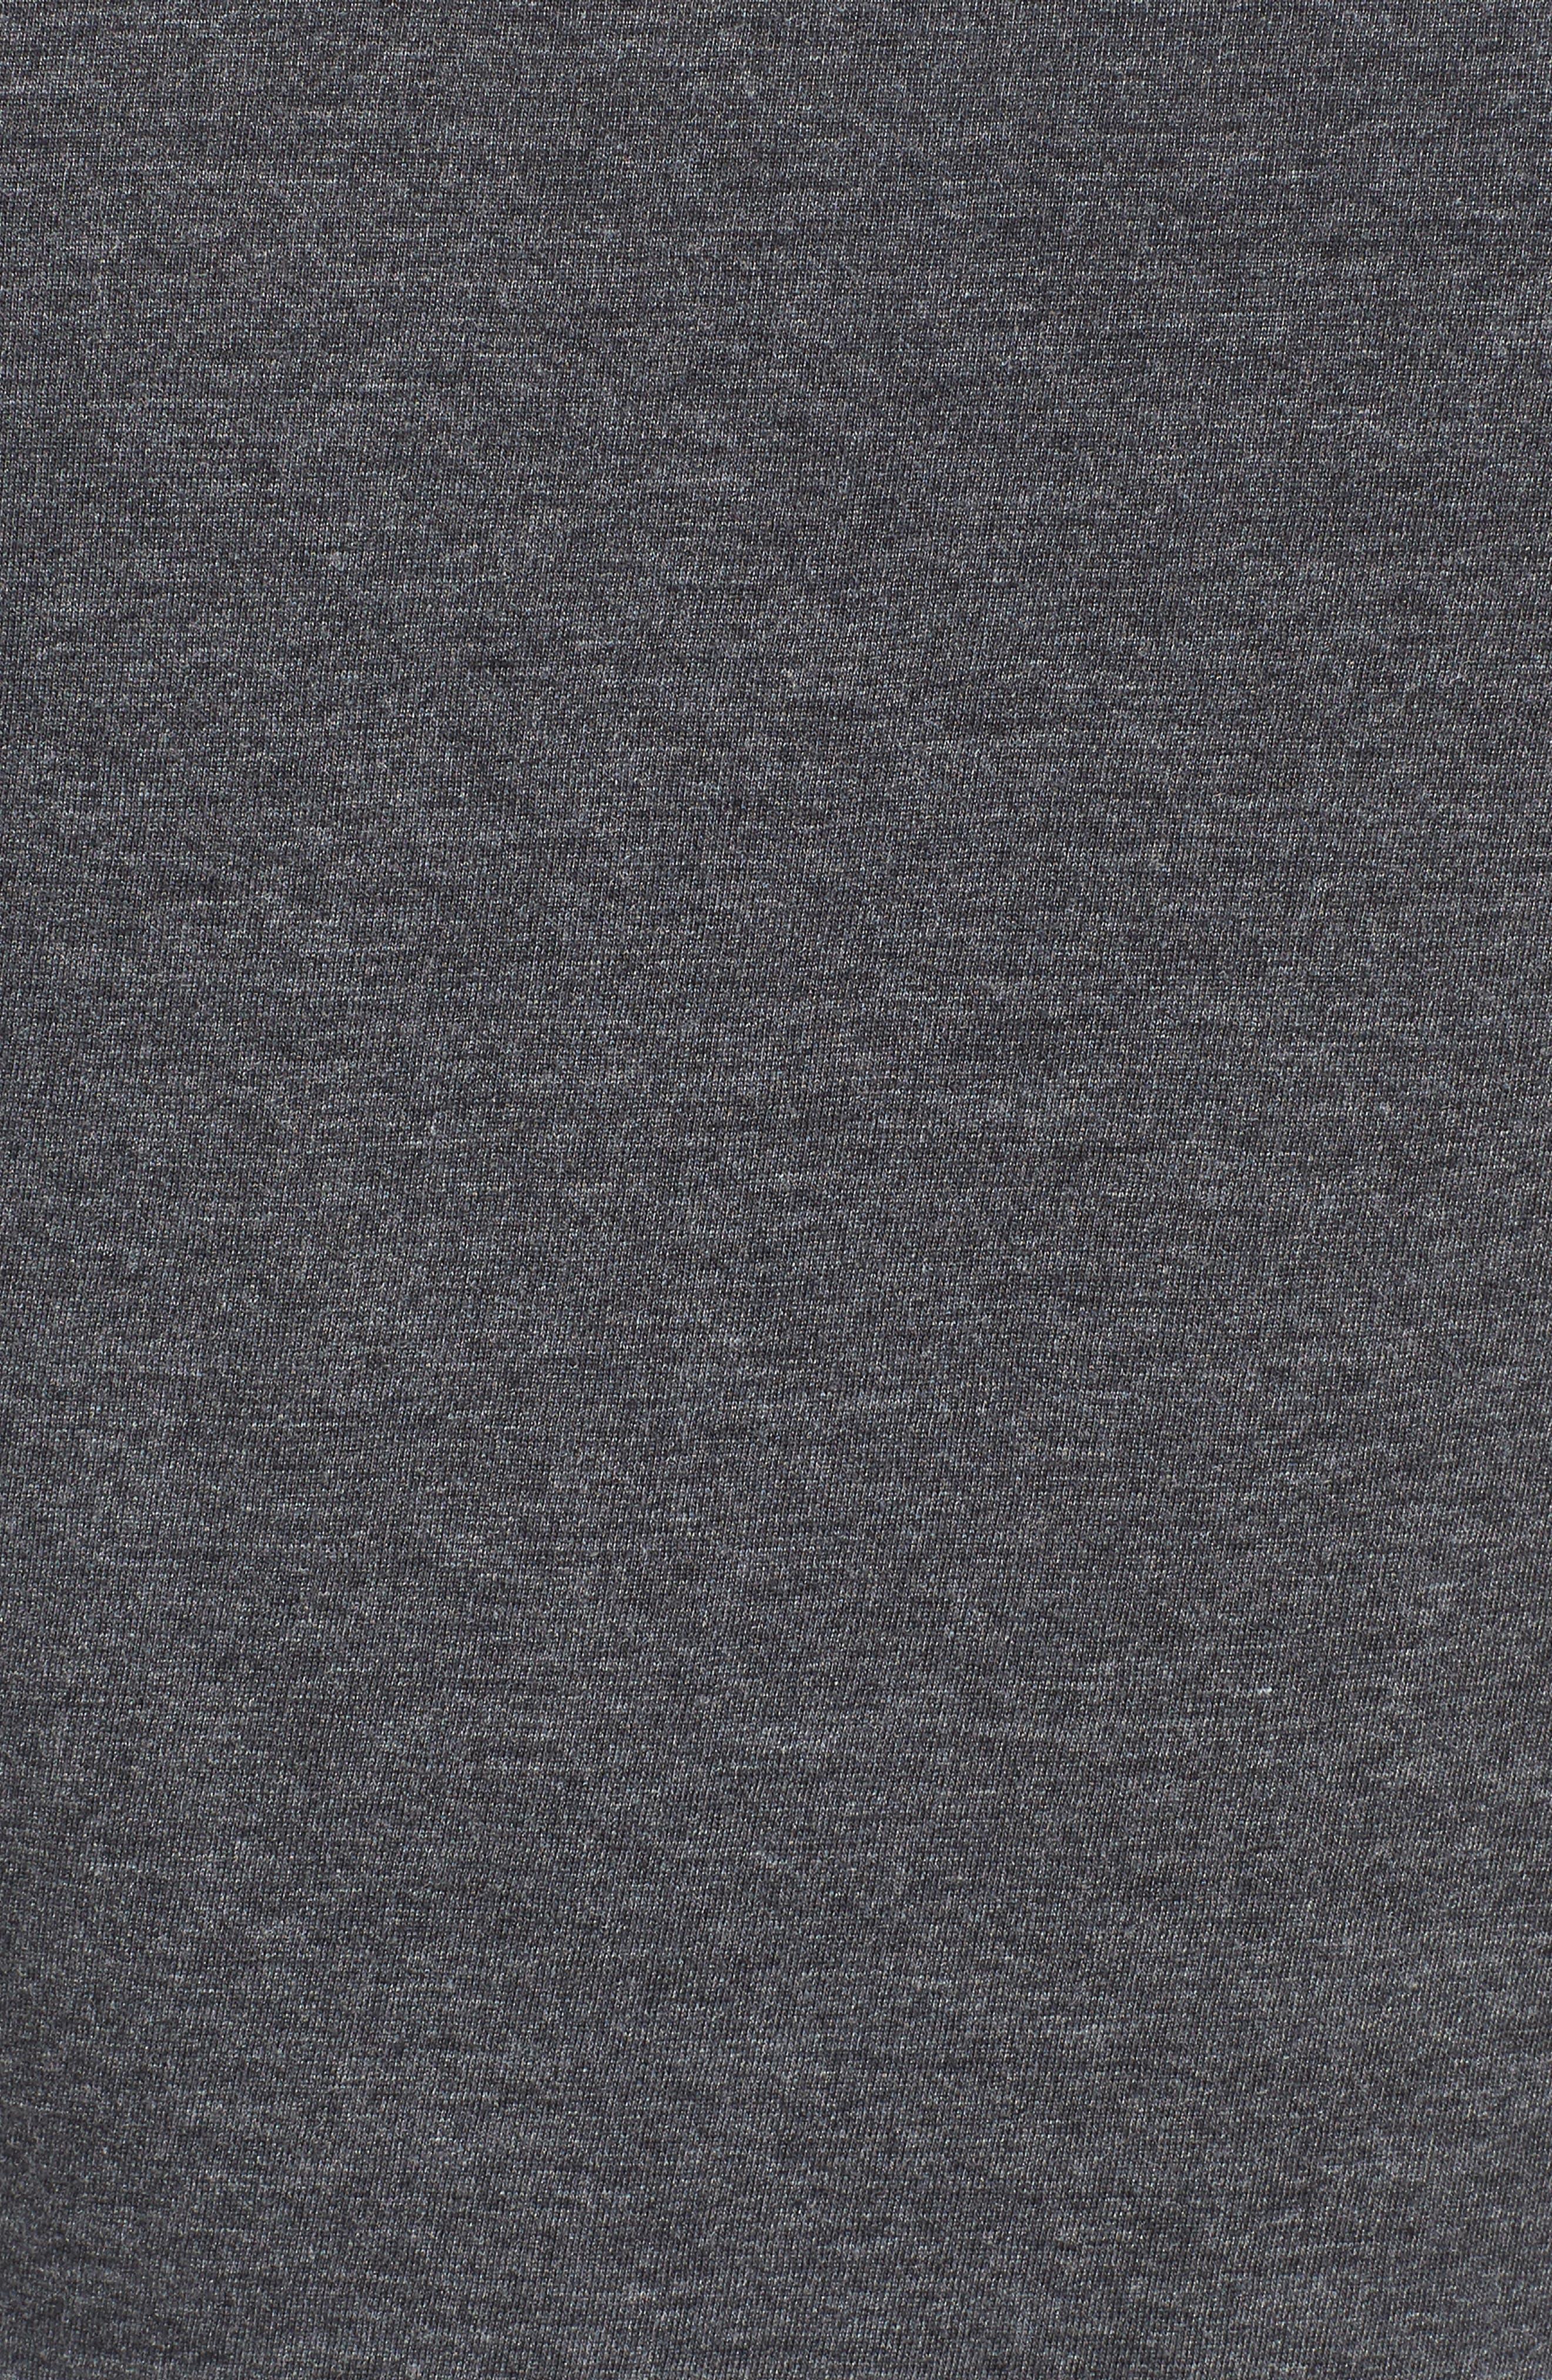 Snooze Cloud Graphic T-Shirt,                             Alternate thumbnail 5, color,                             001